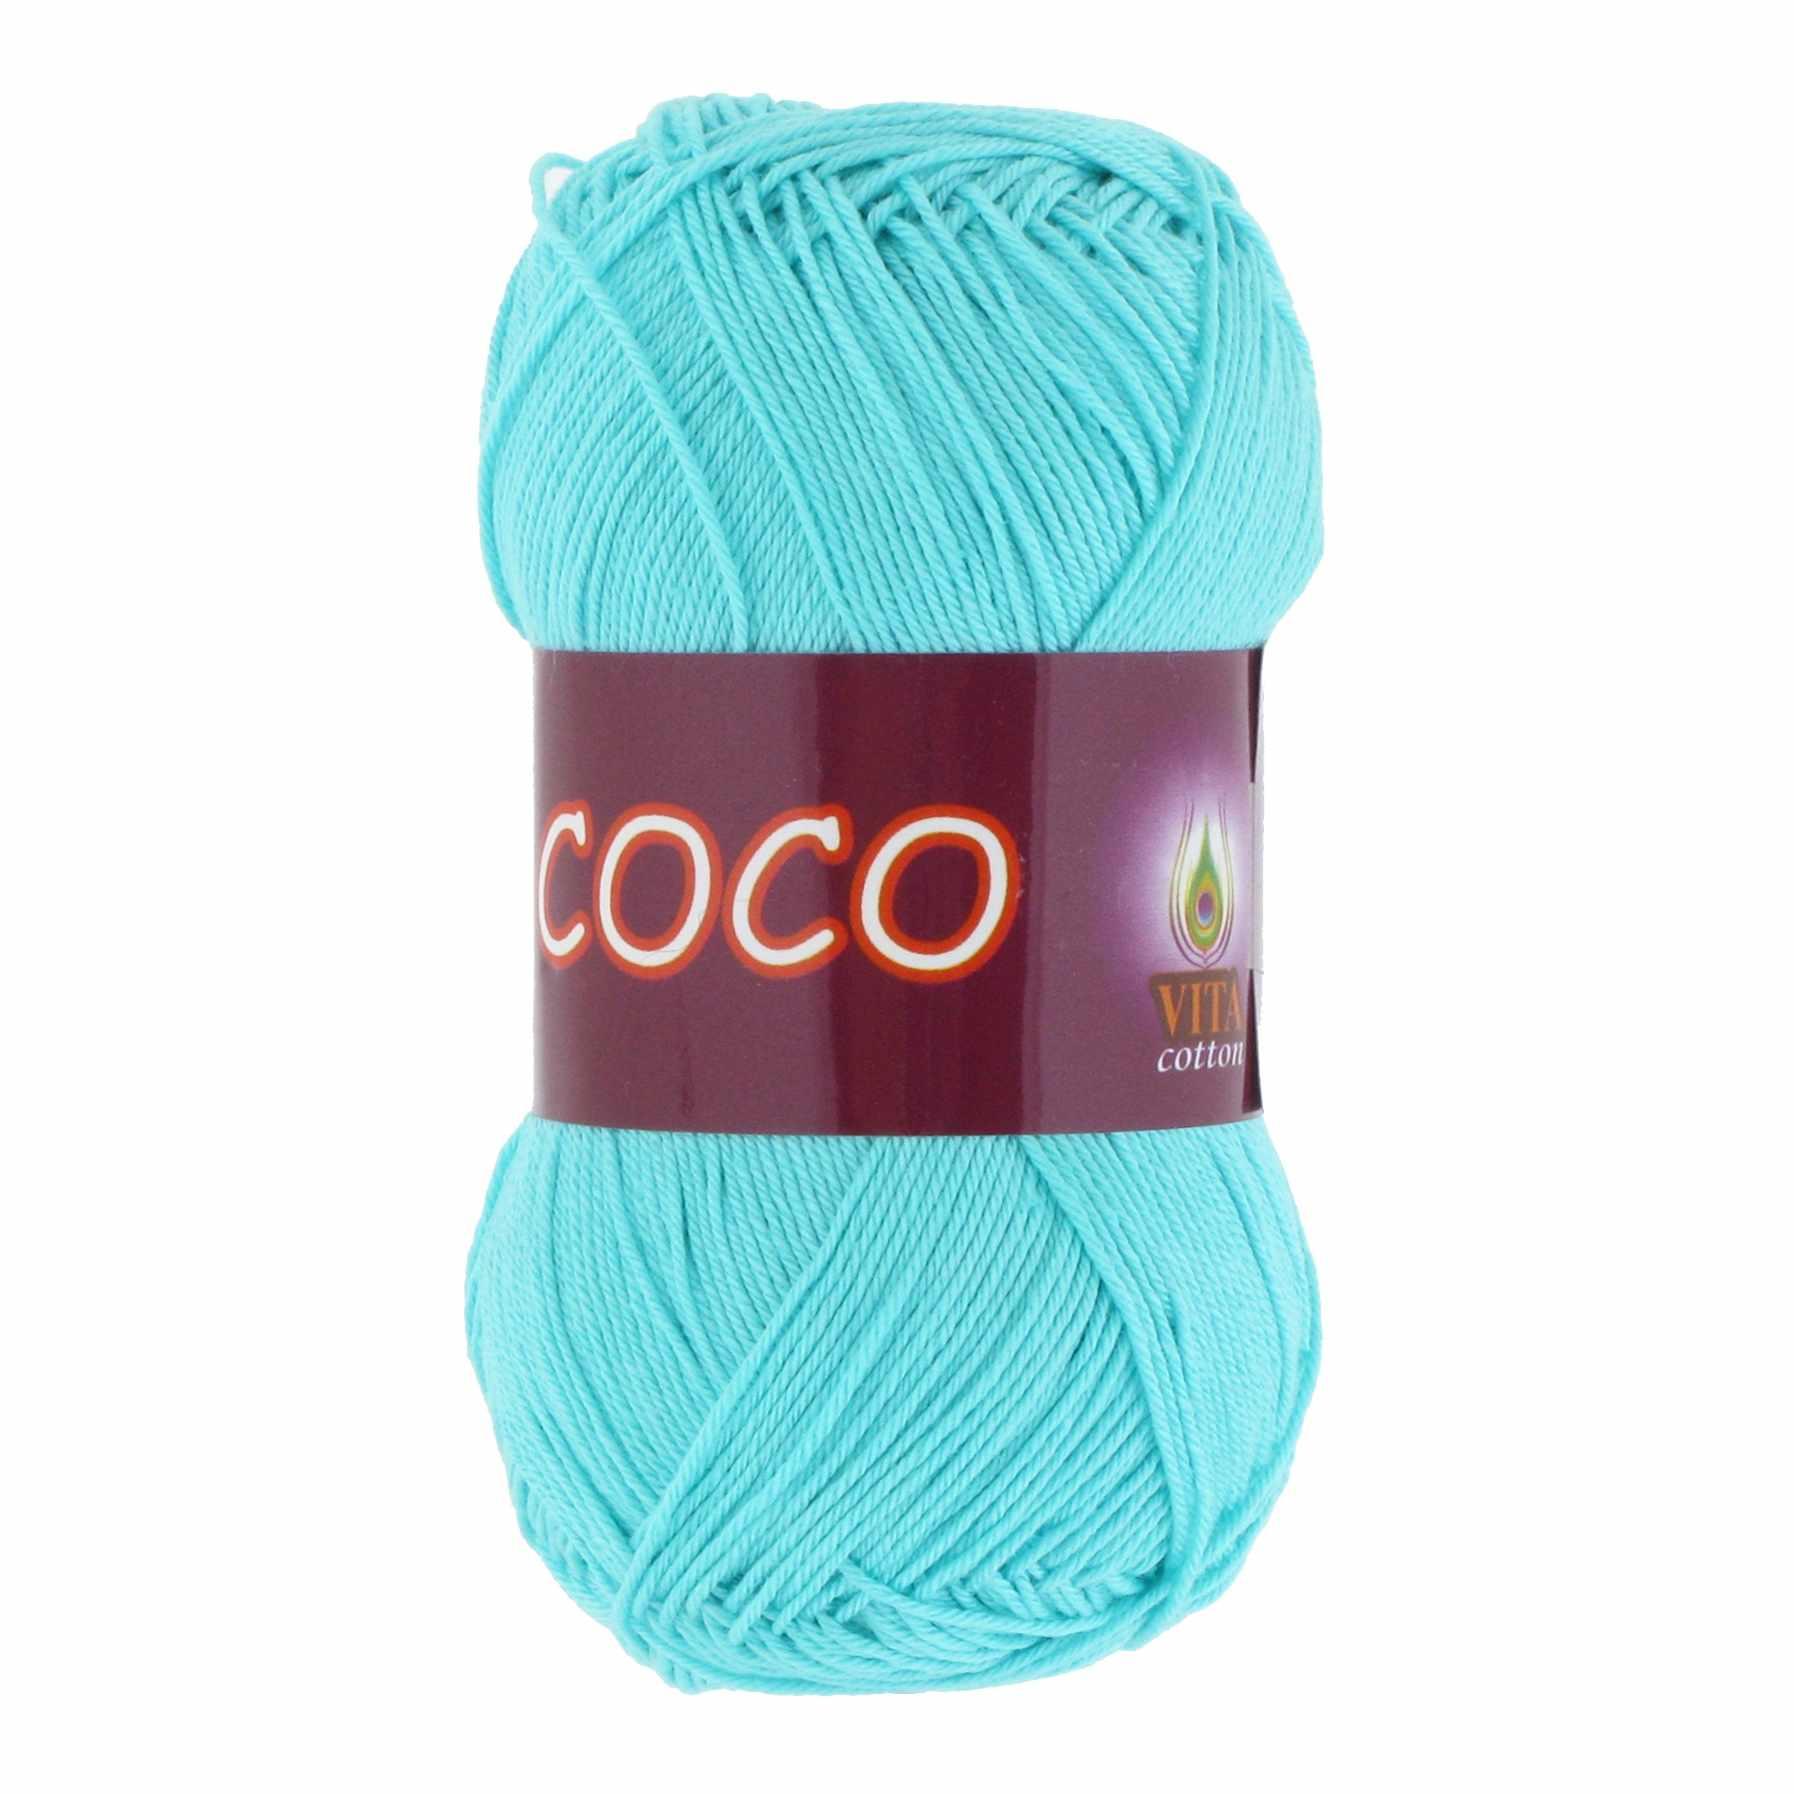 Пряжа VITA Coco Цвет.3867 Светлая зеленая бирюза